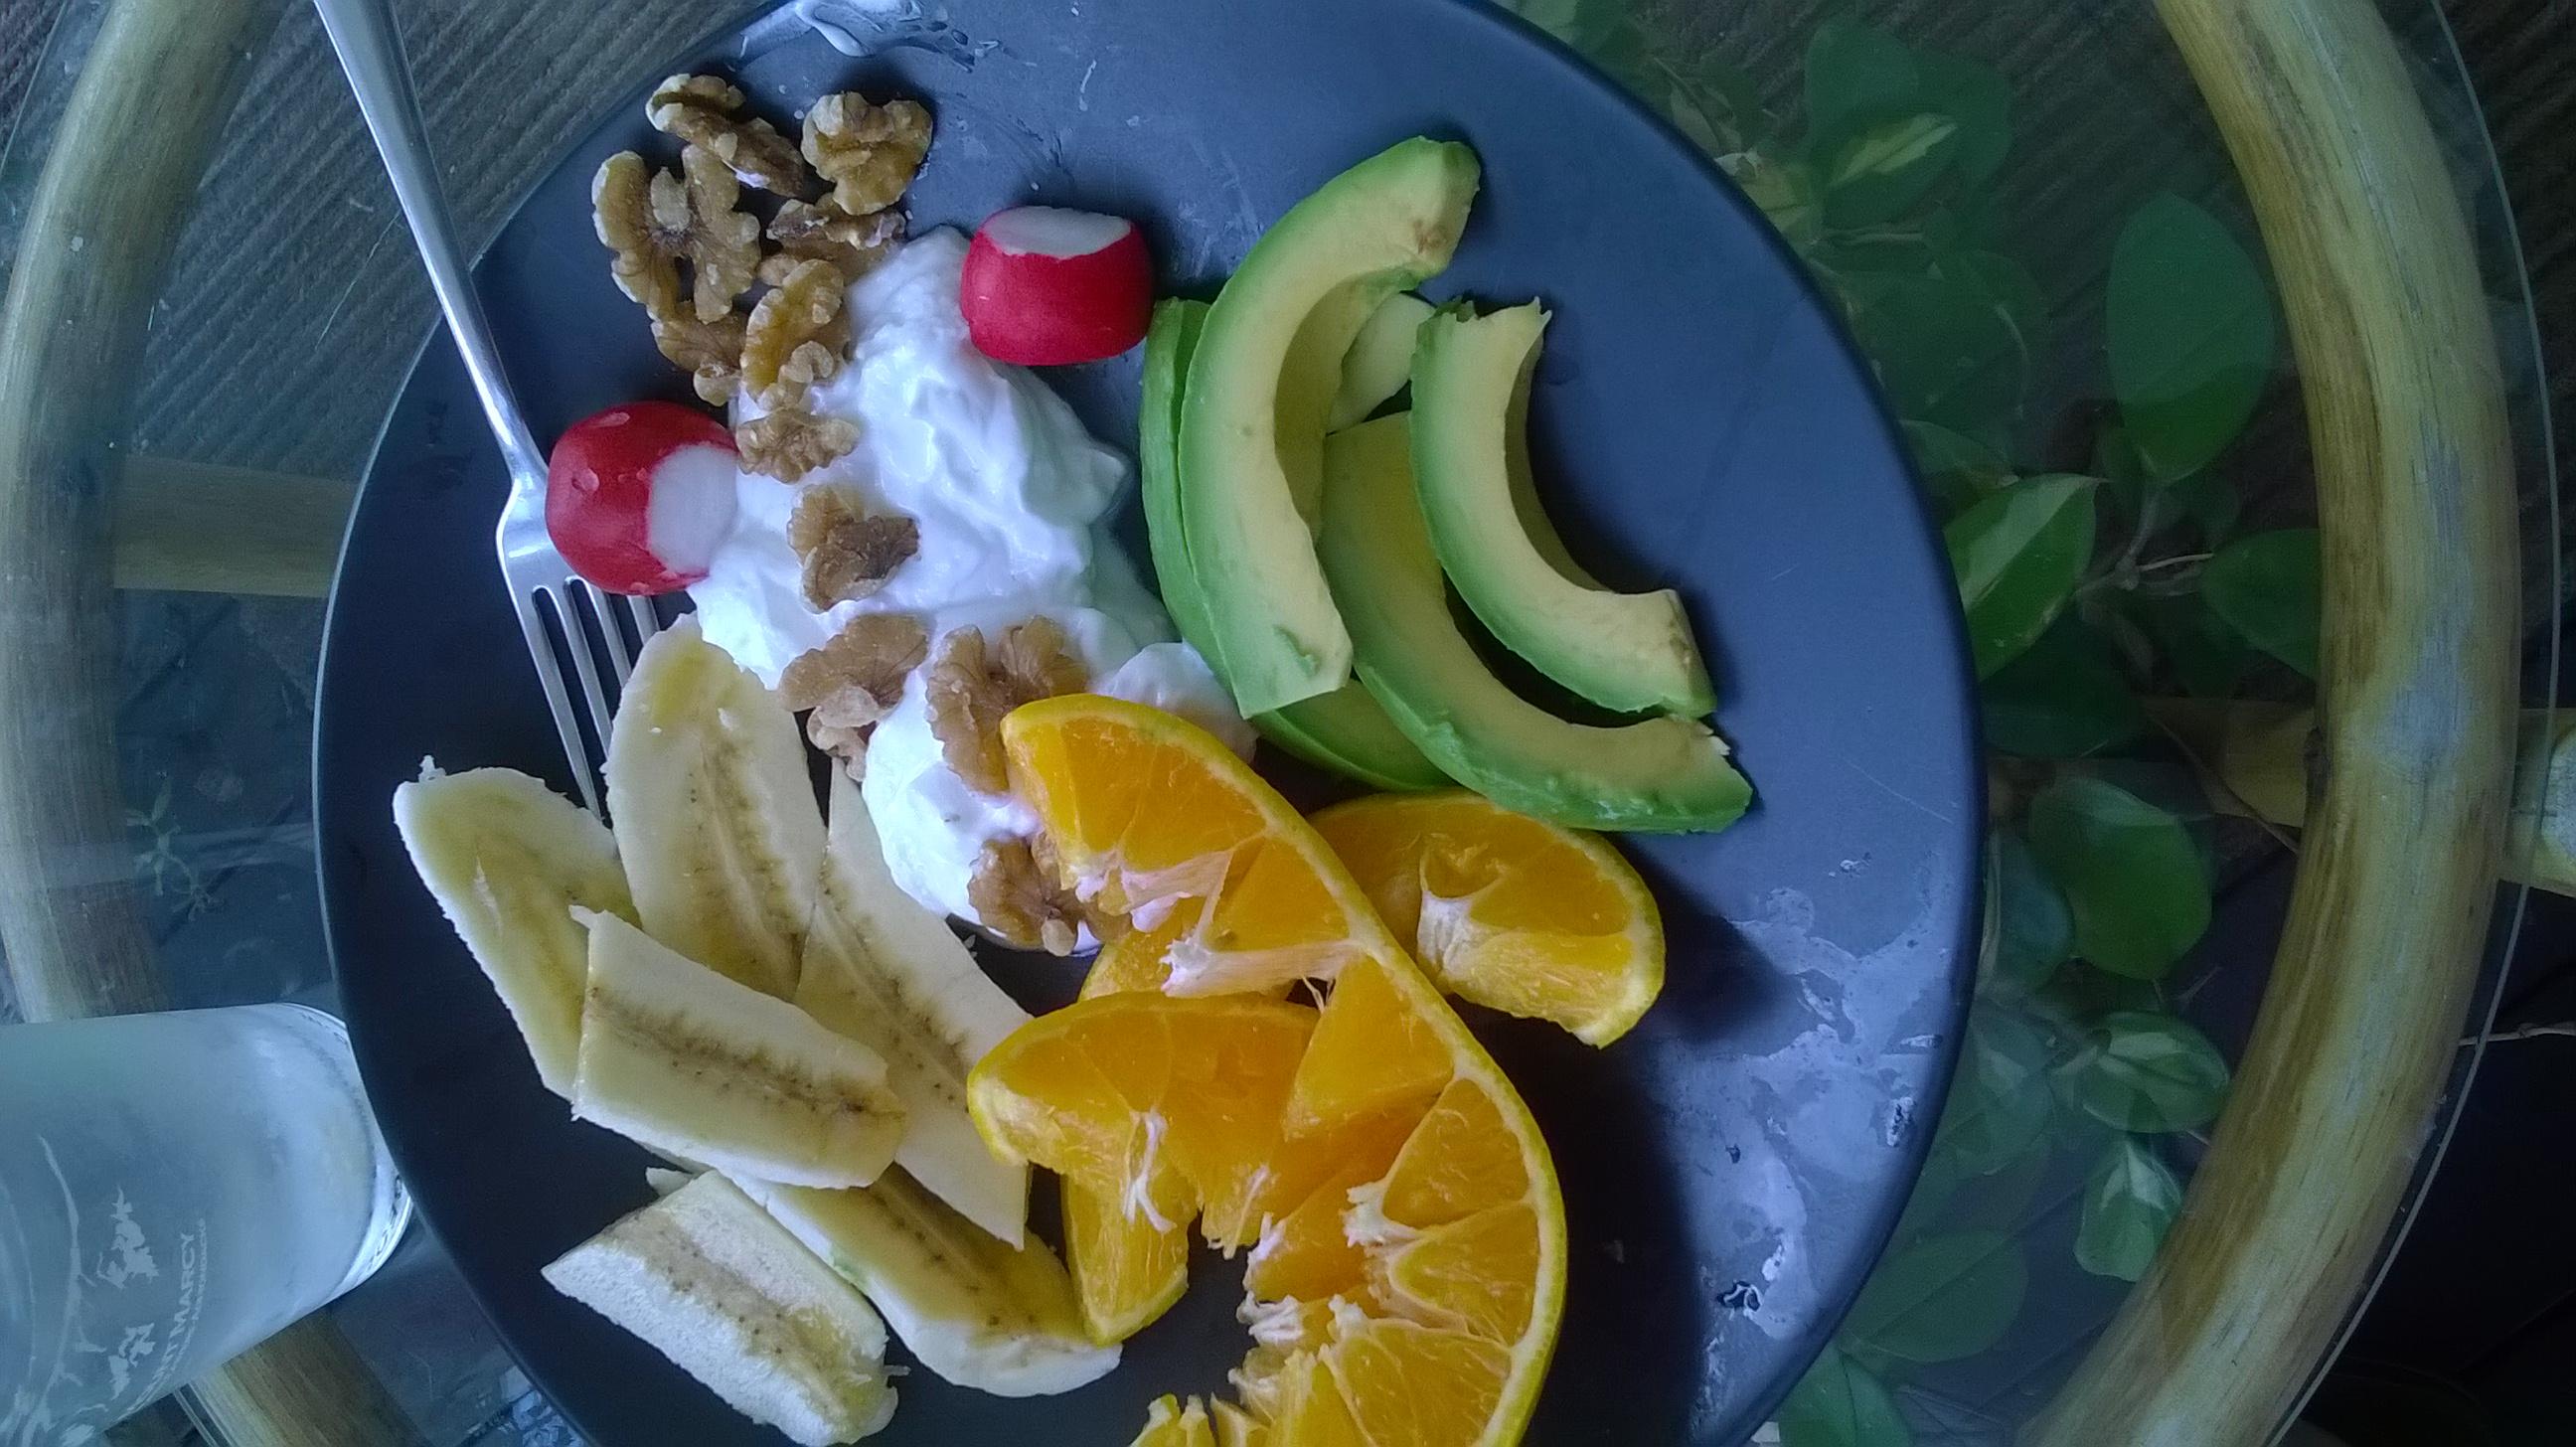 manchester nh :: yogurt and fresh fruits